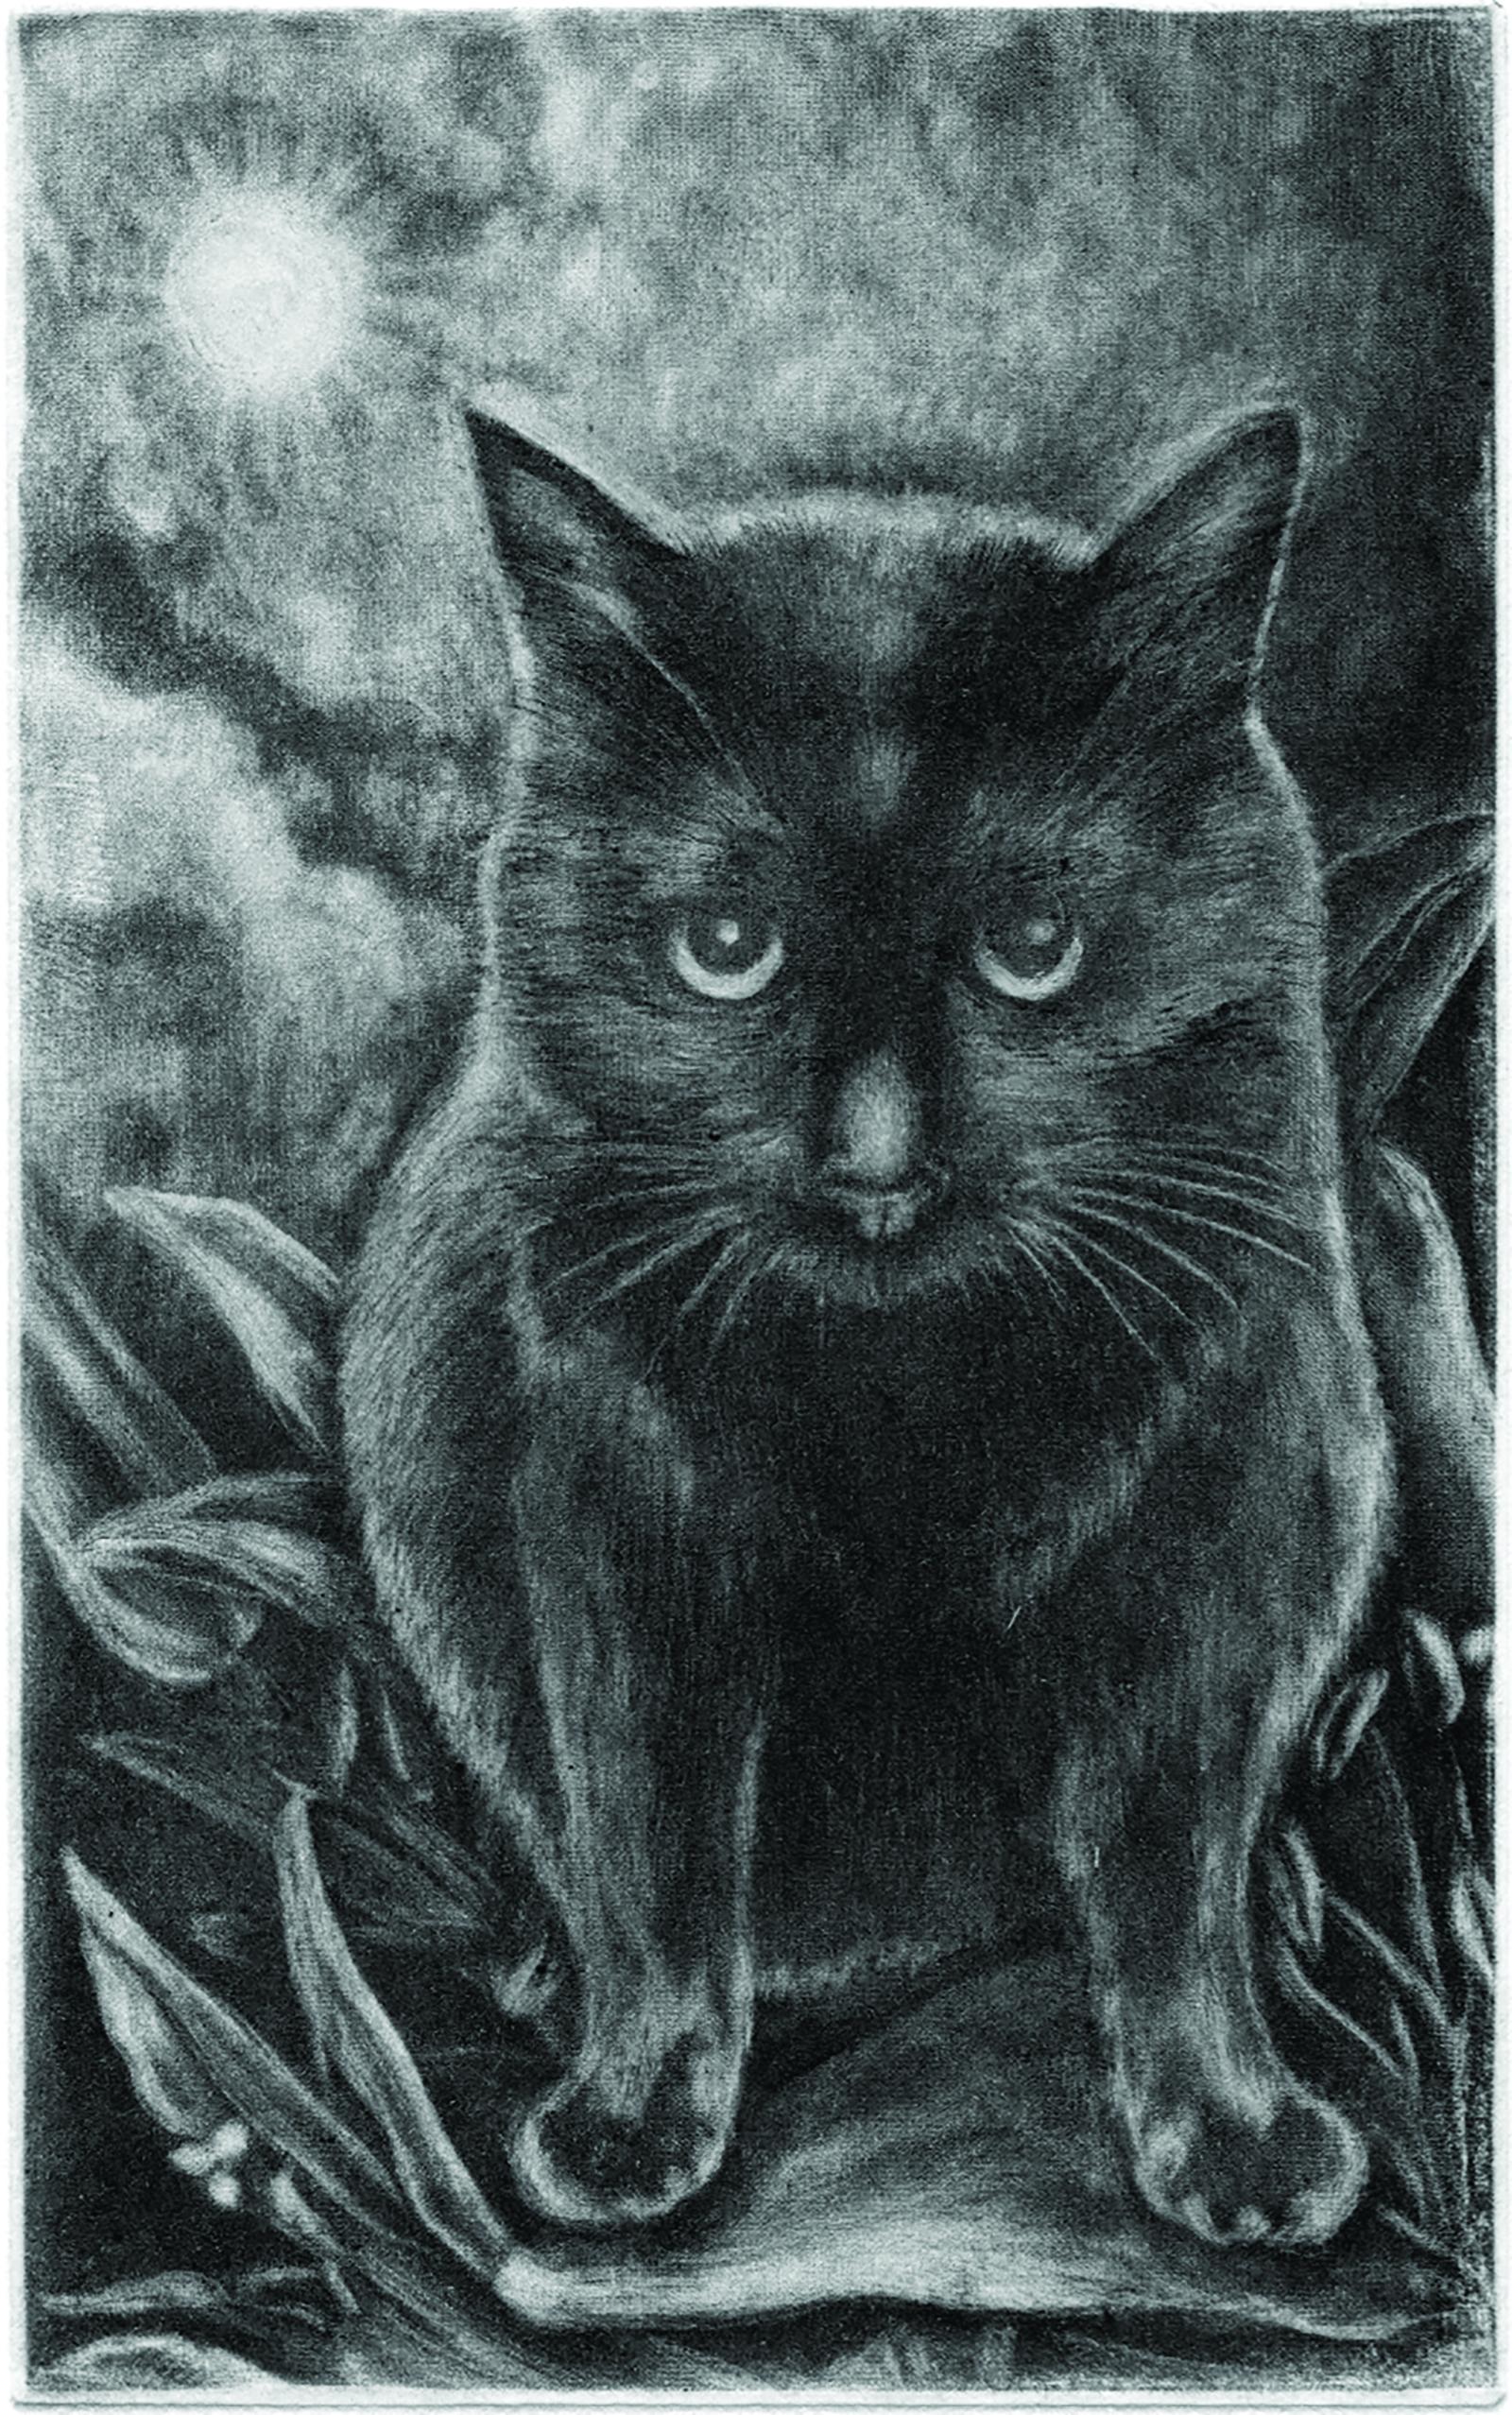 Kuro in black (drypoint etching by Yaemi Shigyo)